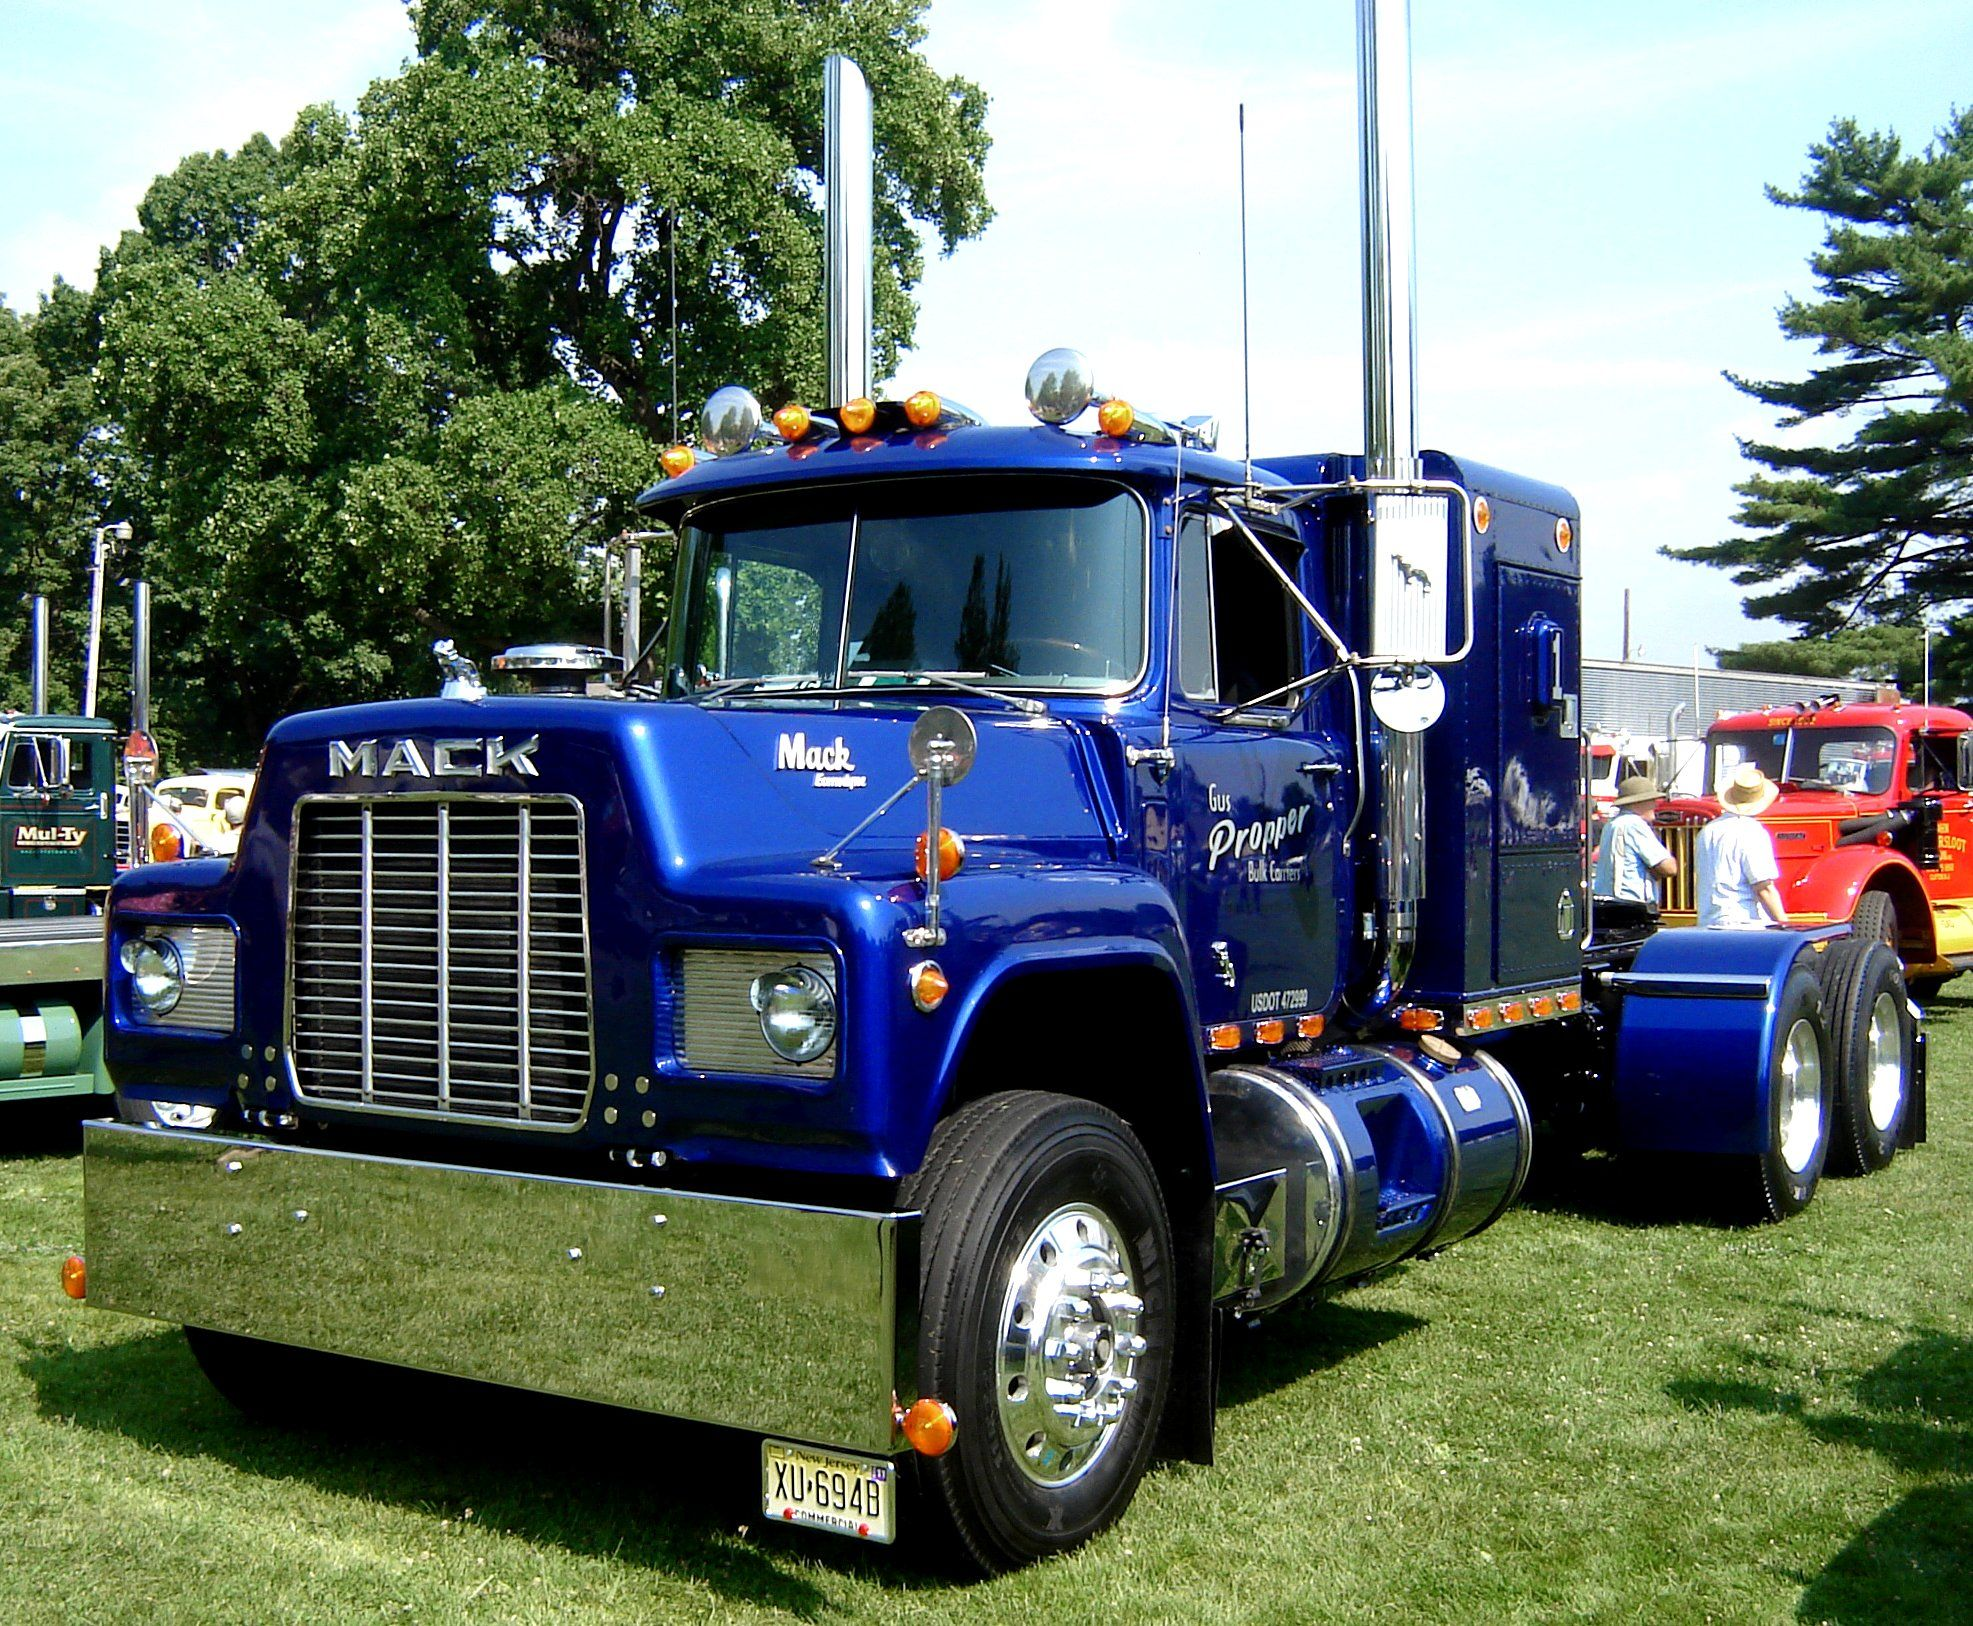 Mack R Truck Heavyhauling Truckertuesday Truckin Trucklife